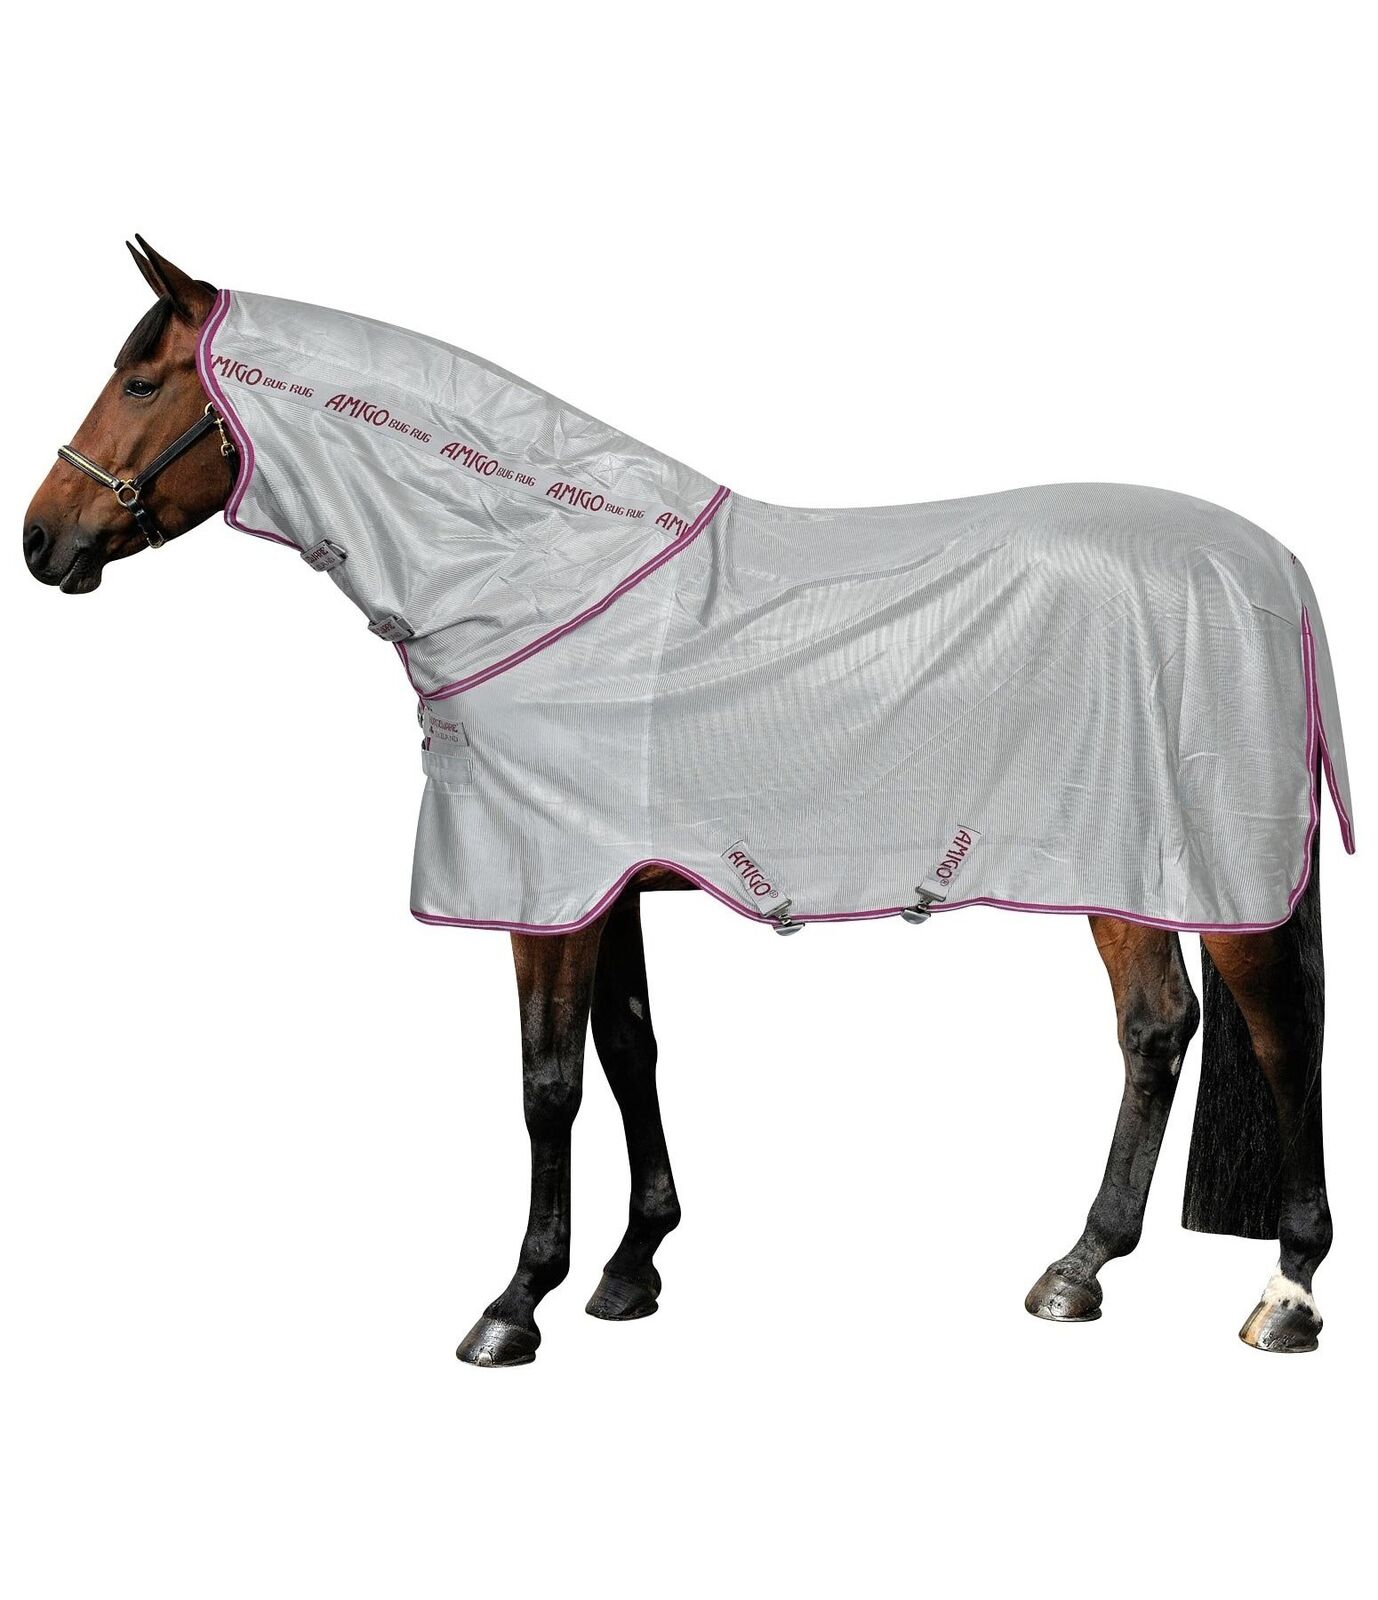 Horseware Amigo Bug Rug Fly Blanket